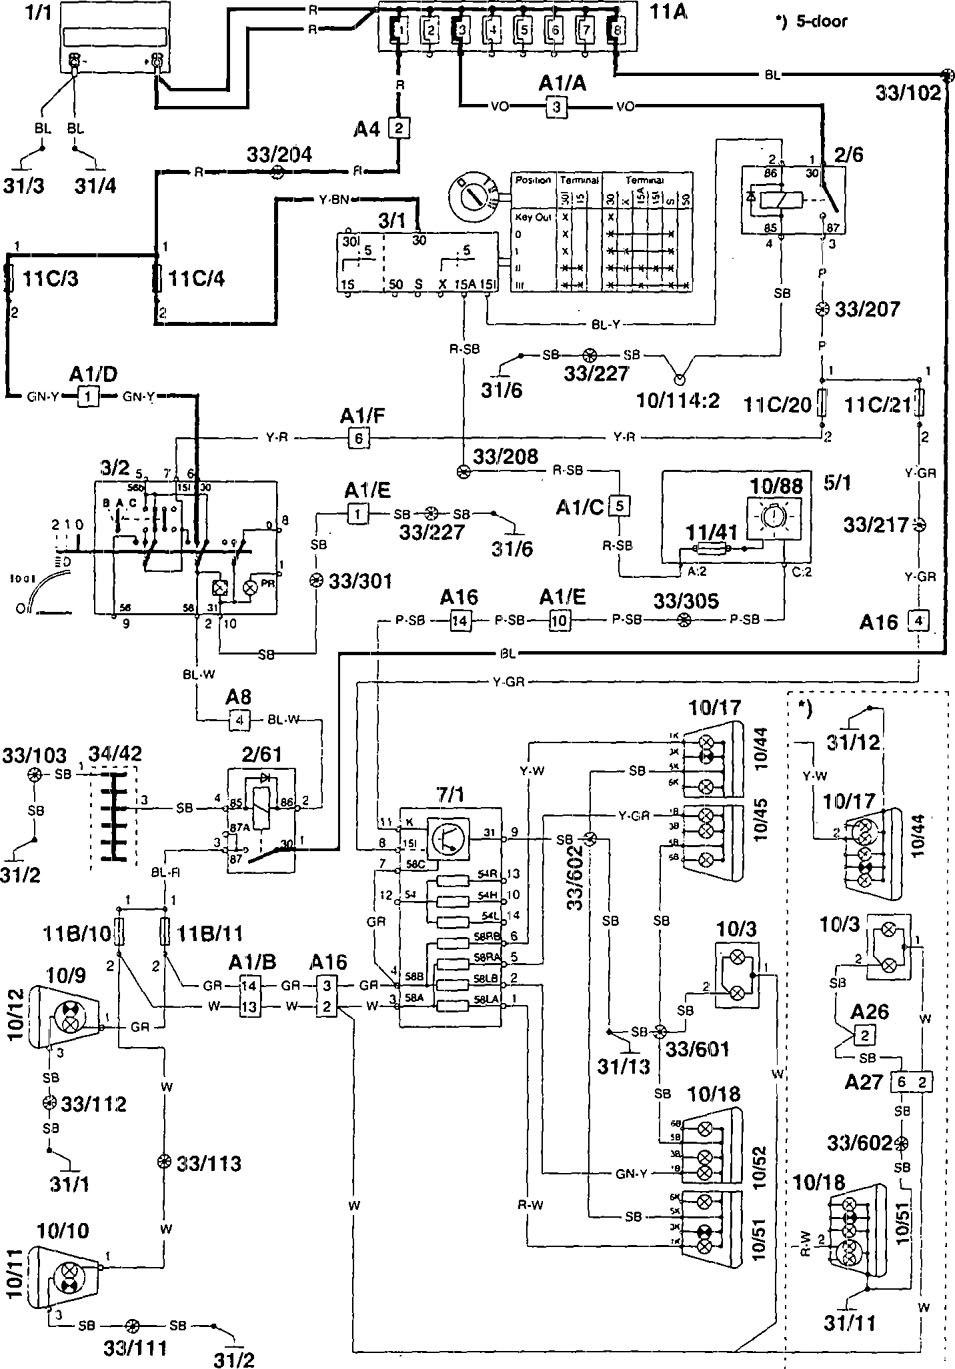 Volvo 960 1995 Wiring Diagrams Tail Lamps Carknowledge Hyundai Starex Diagram